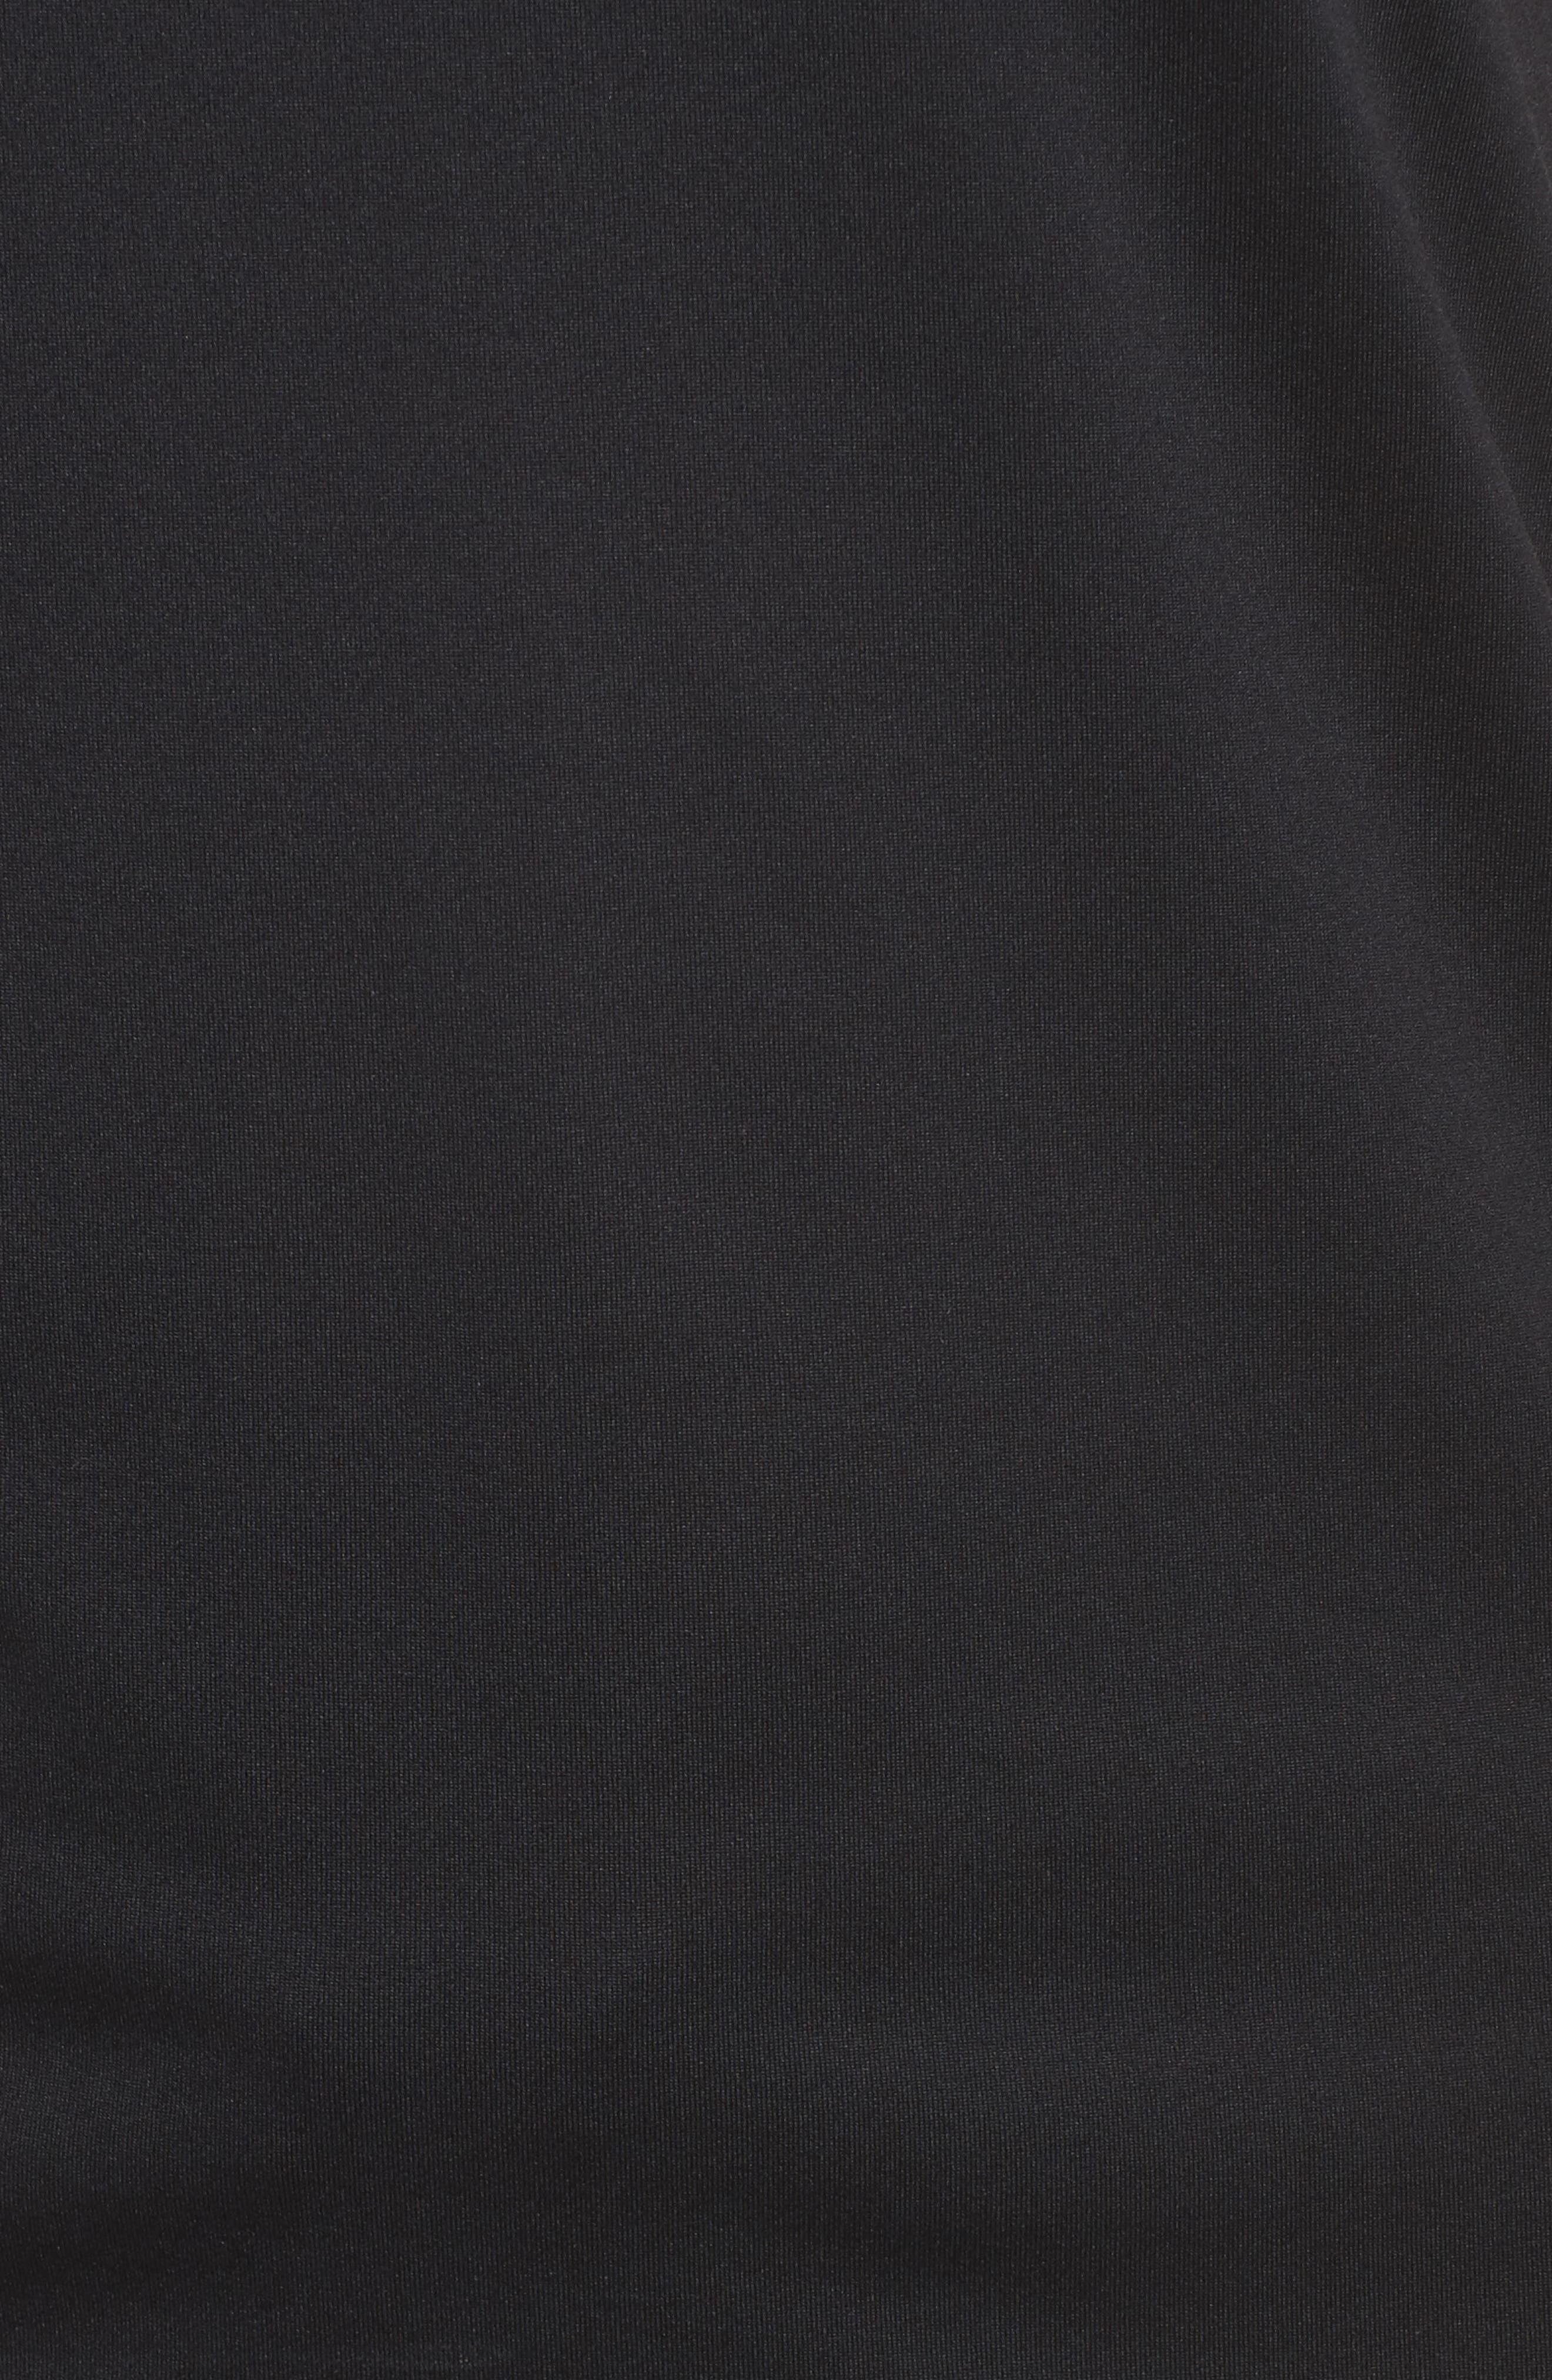 Capilene<sup>®</sup> Dailty T-Shirt,                             Alternate thumbnail 6, color,                             Black